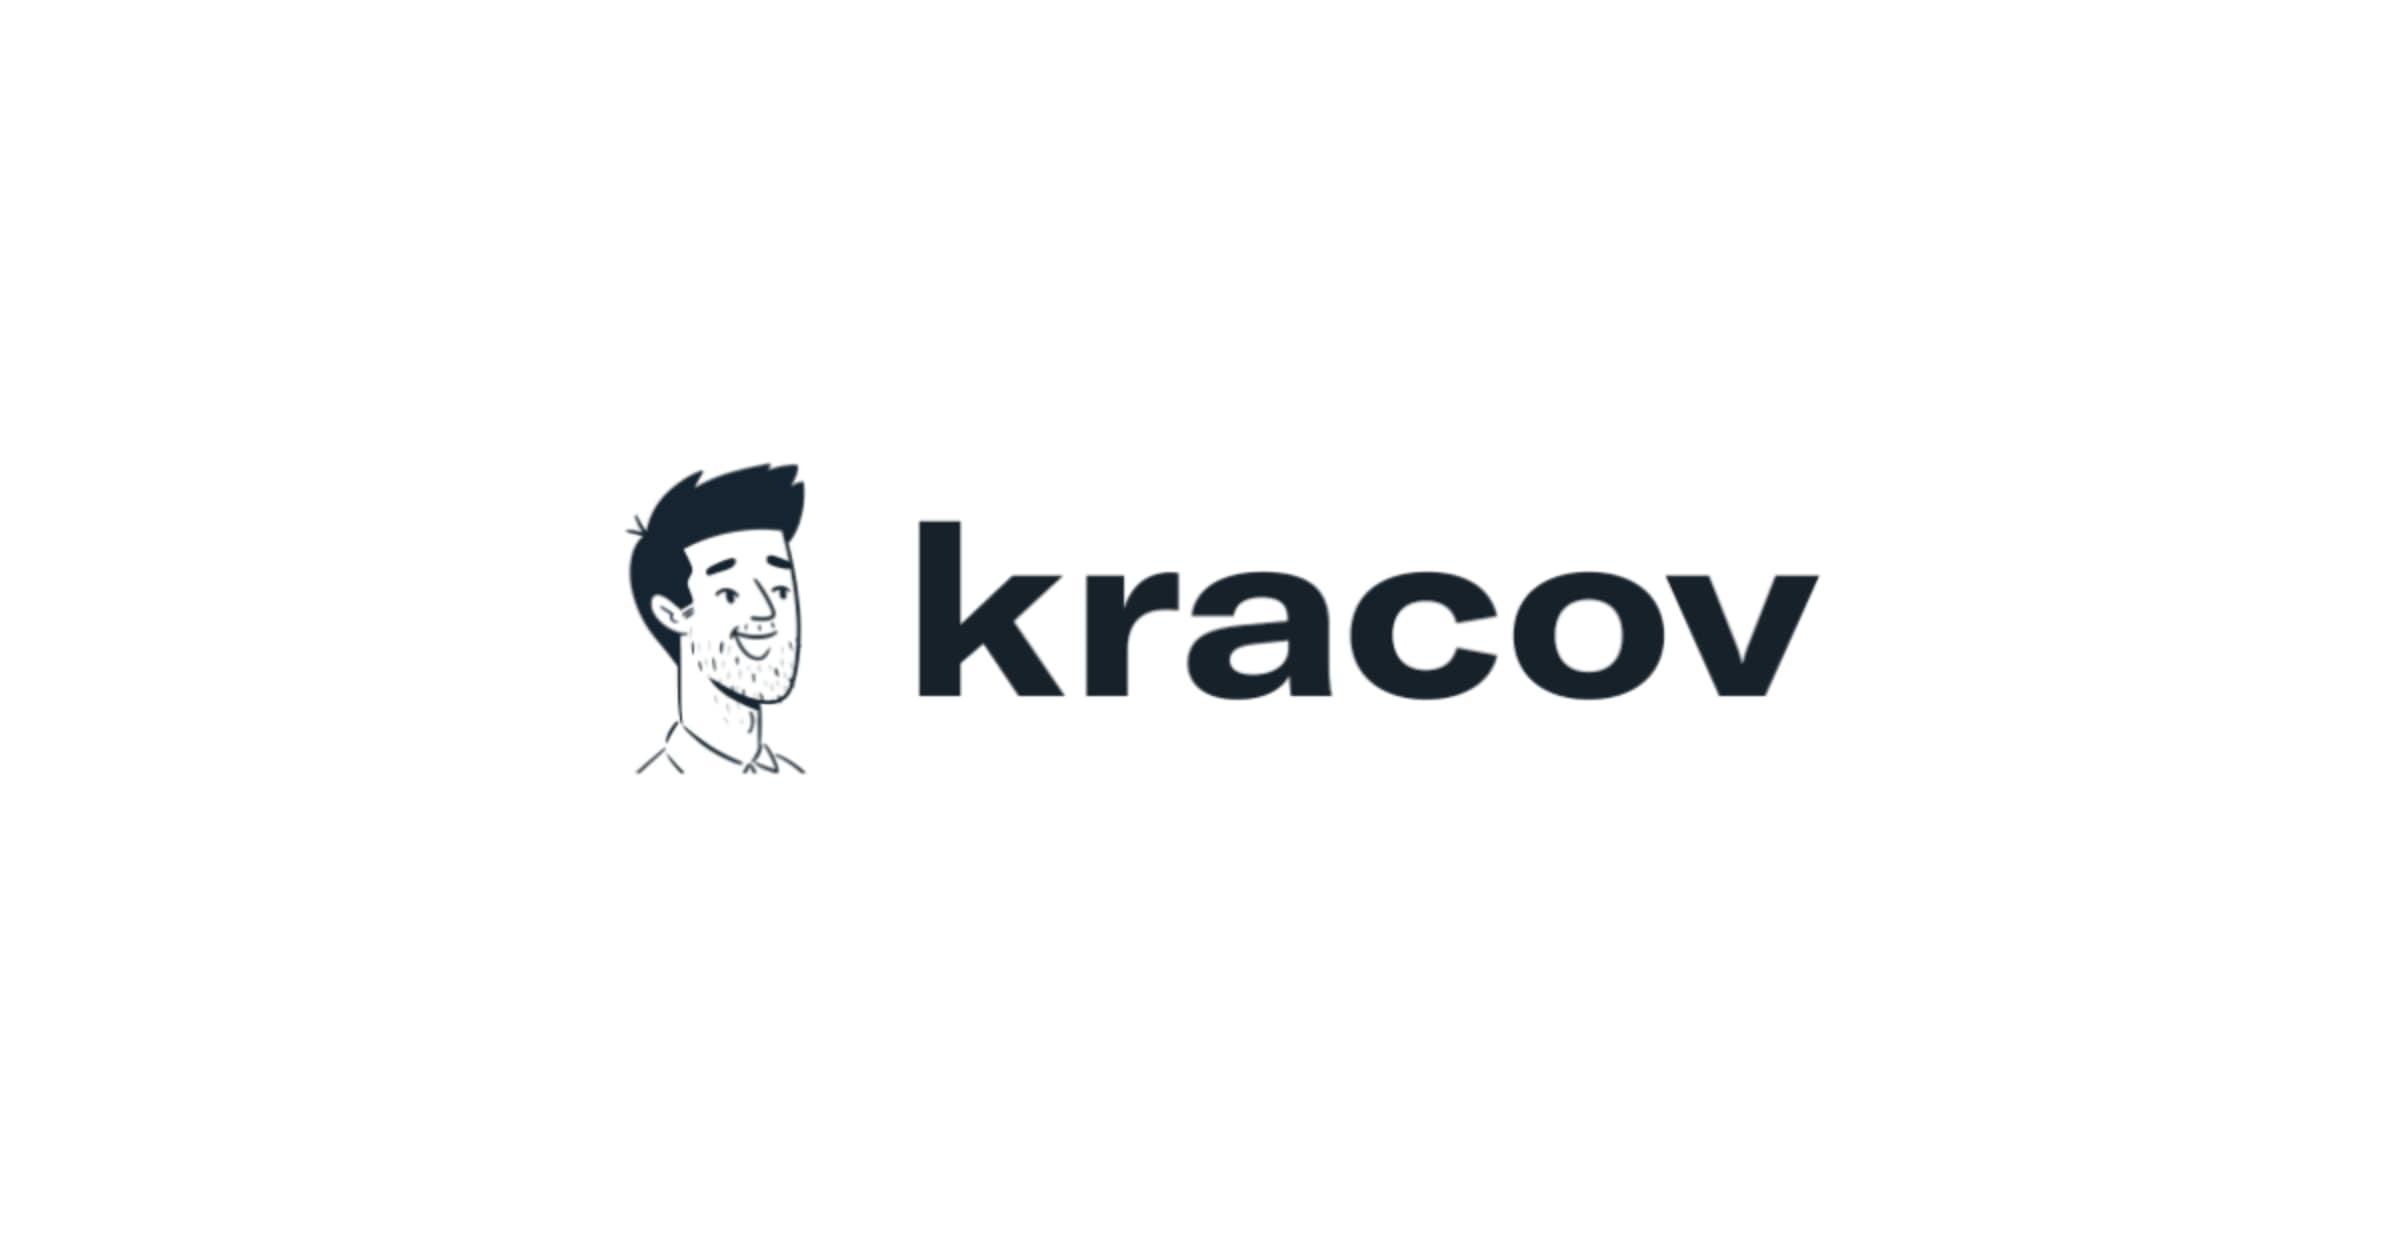 Alex Kracov